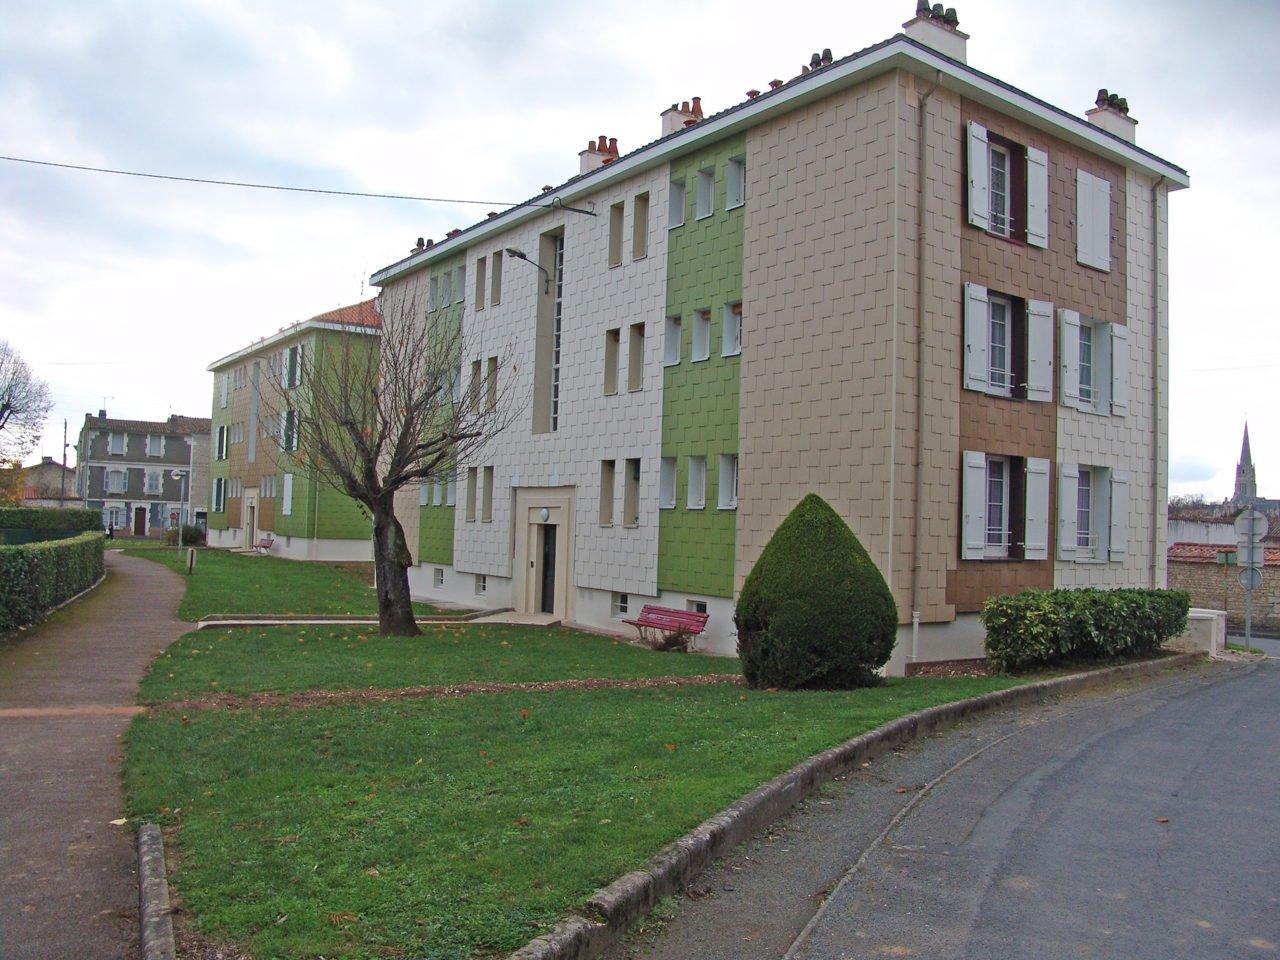 Residence de la sabliere vend e habitat for Location garage fontenay le comte